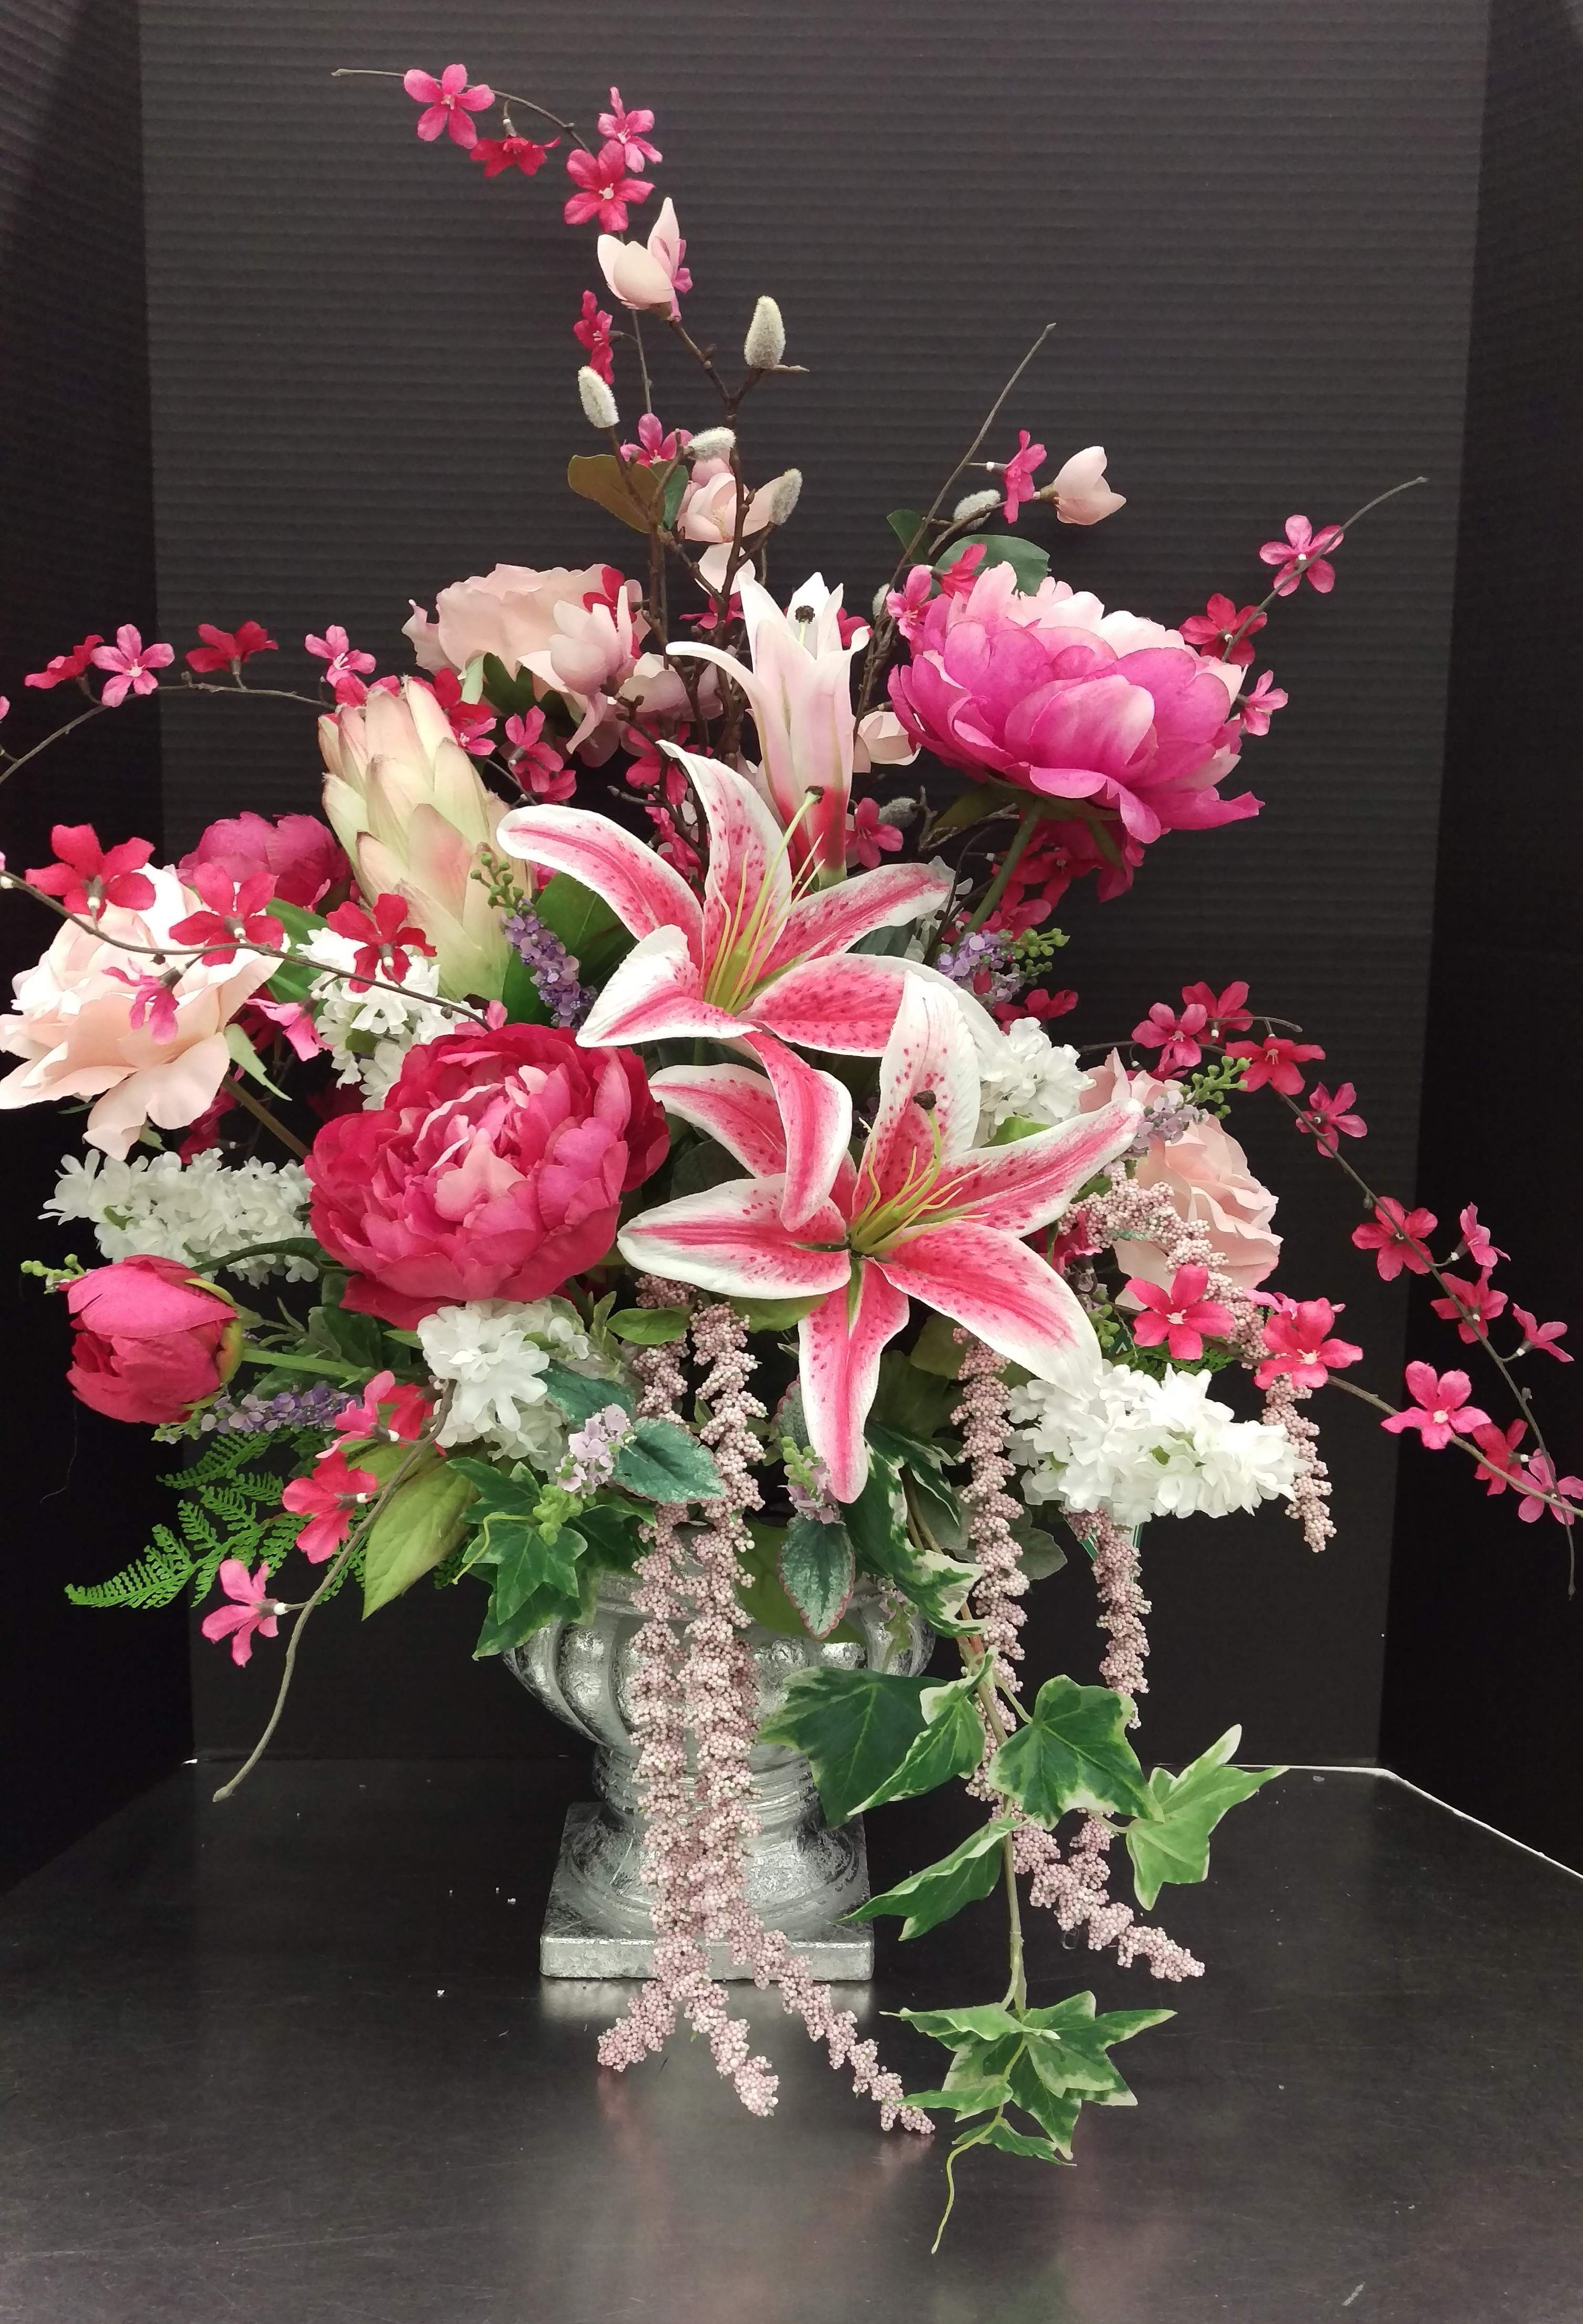 Spring 2017 By Randi Sheldon At Michaels 1600 Spring Floral Arrangements Silk Spring Floral Arrangements Artificial Flower Arrangements